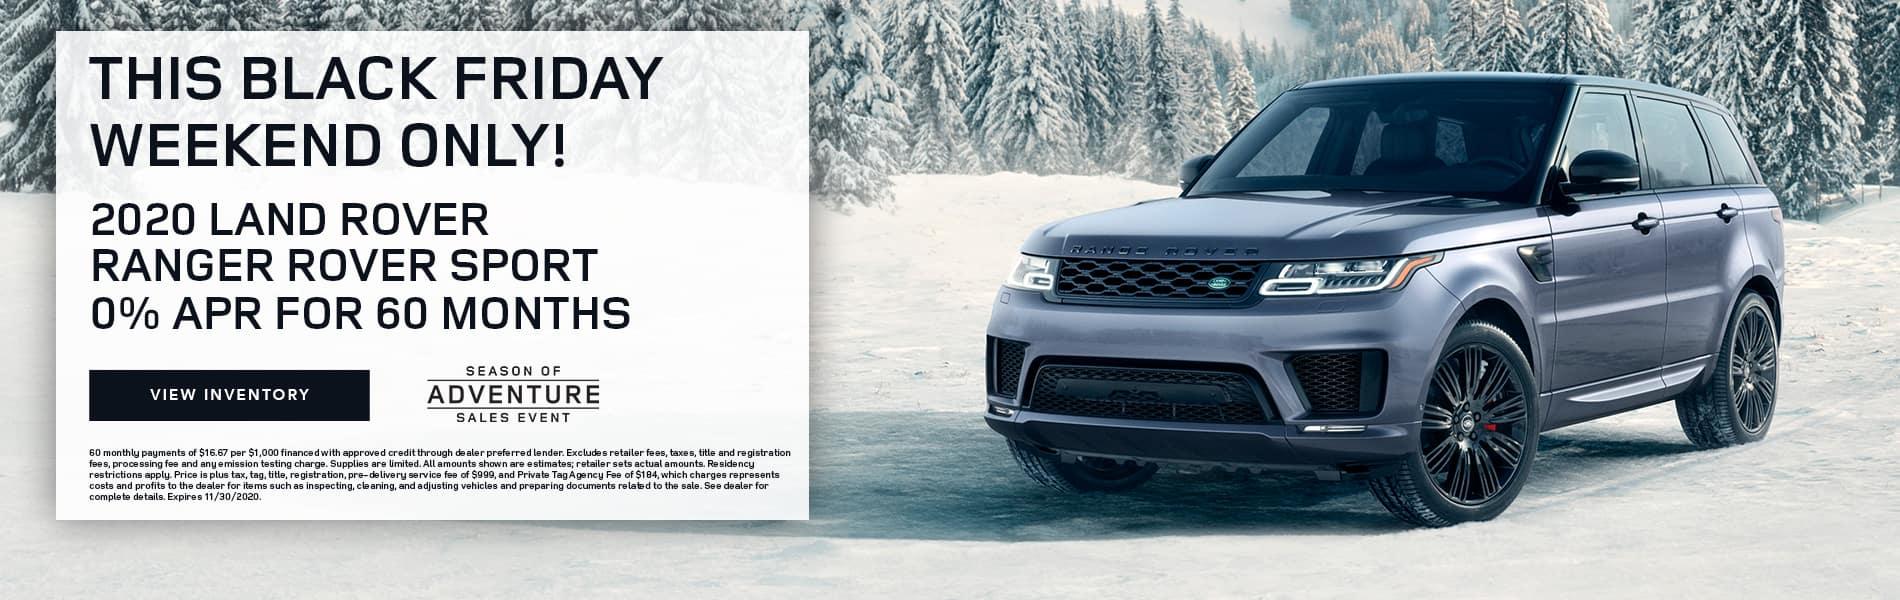 020-1120-LRO3176-SL-Range Rover Sport